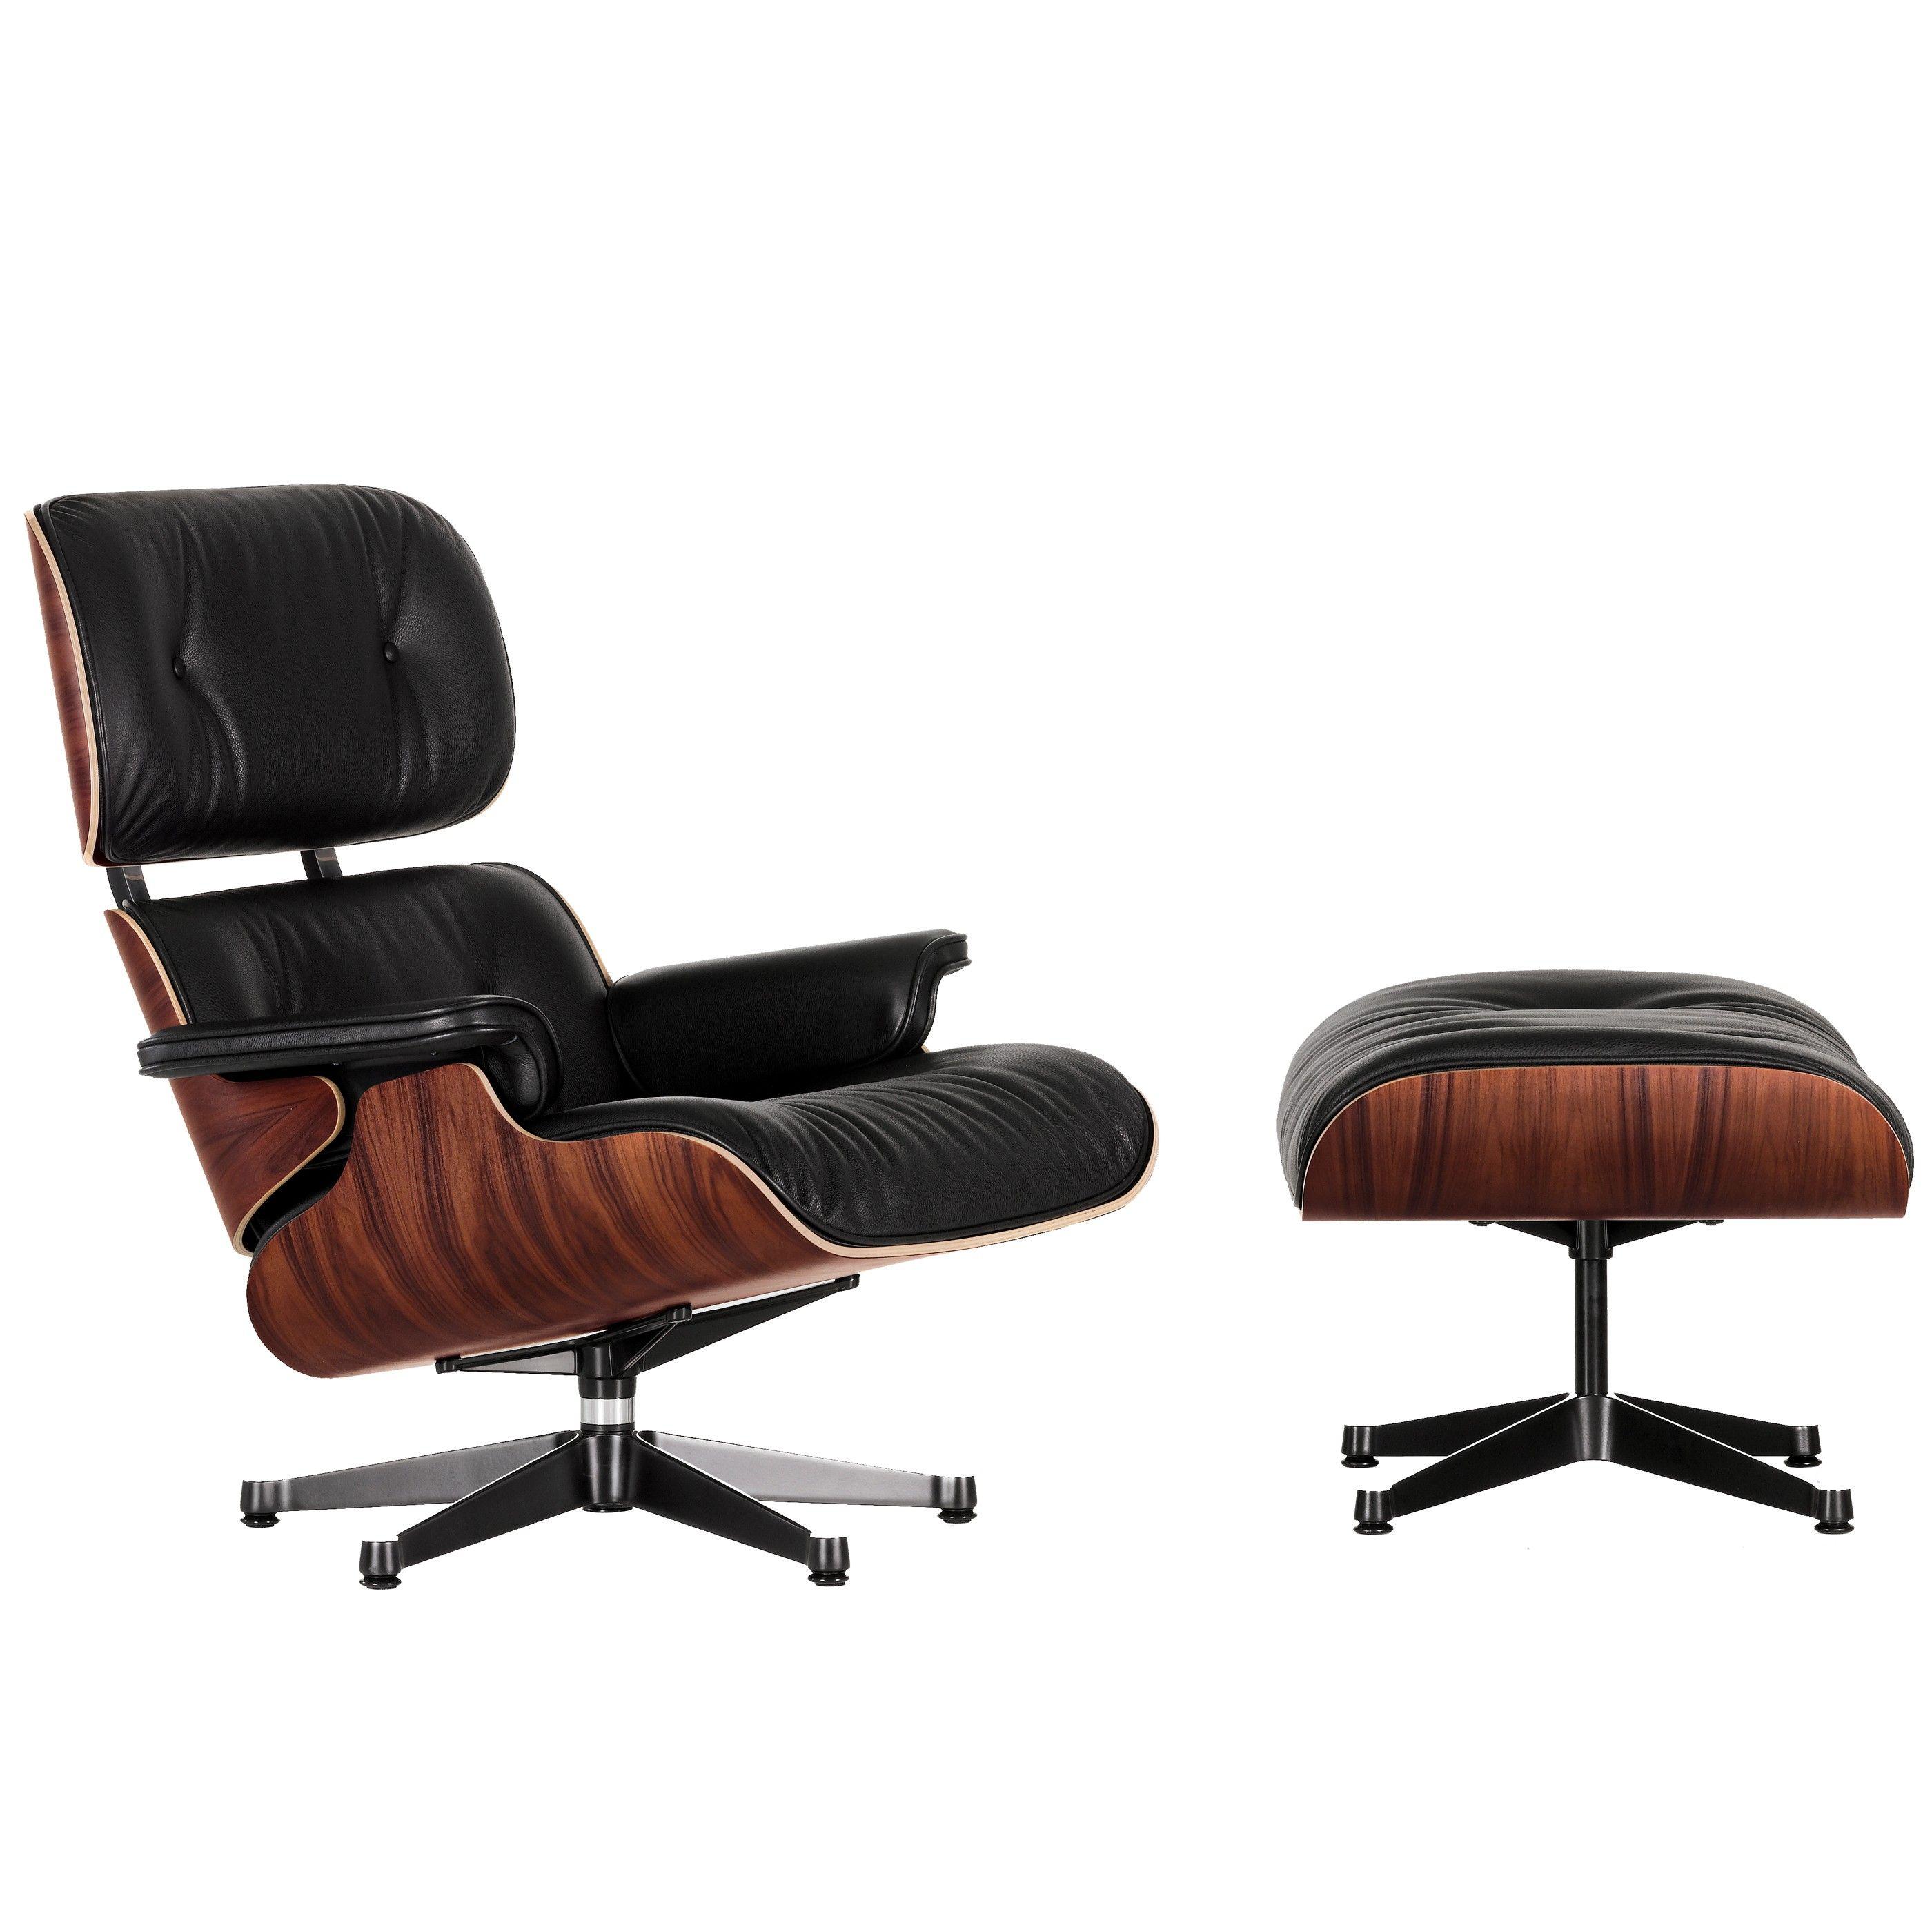 Fauteuil Leer Hout.Vitra Eames Lounge Chair Met Ottoman Fauteuil Klassieke Afmetingen